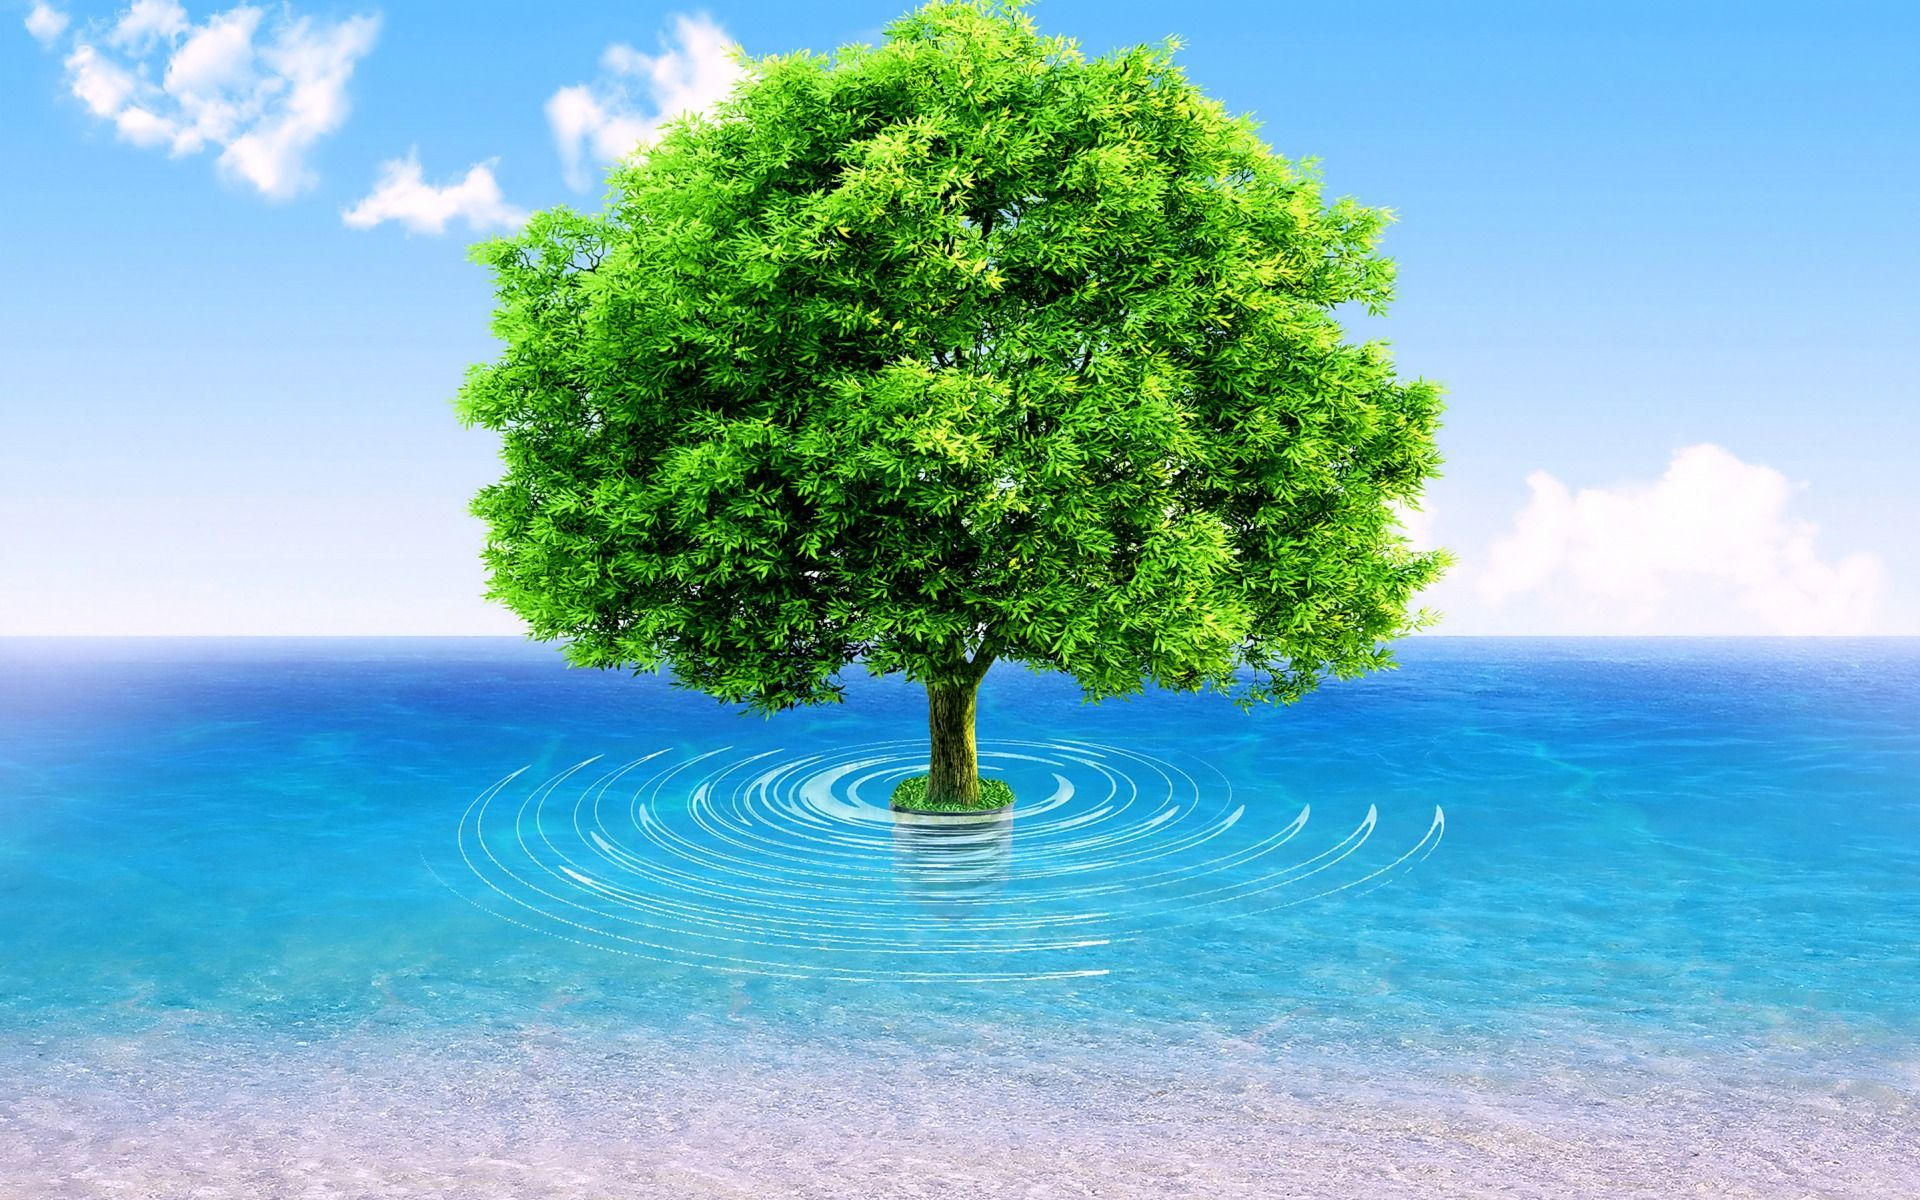 Ocean Tree wallpapers | Ocean Tree stock photos